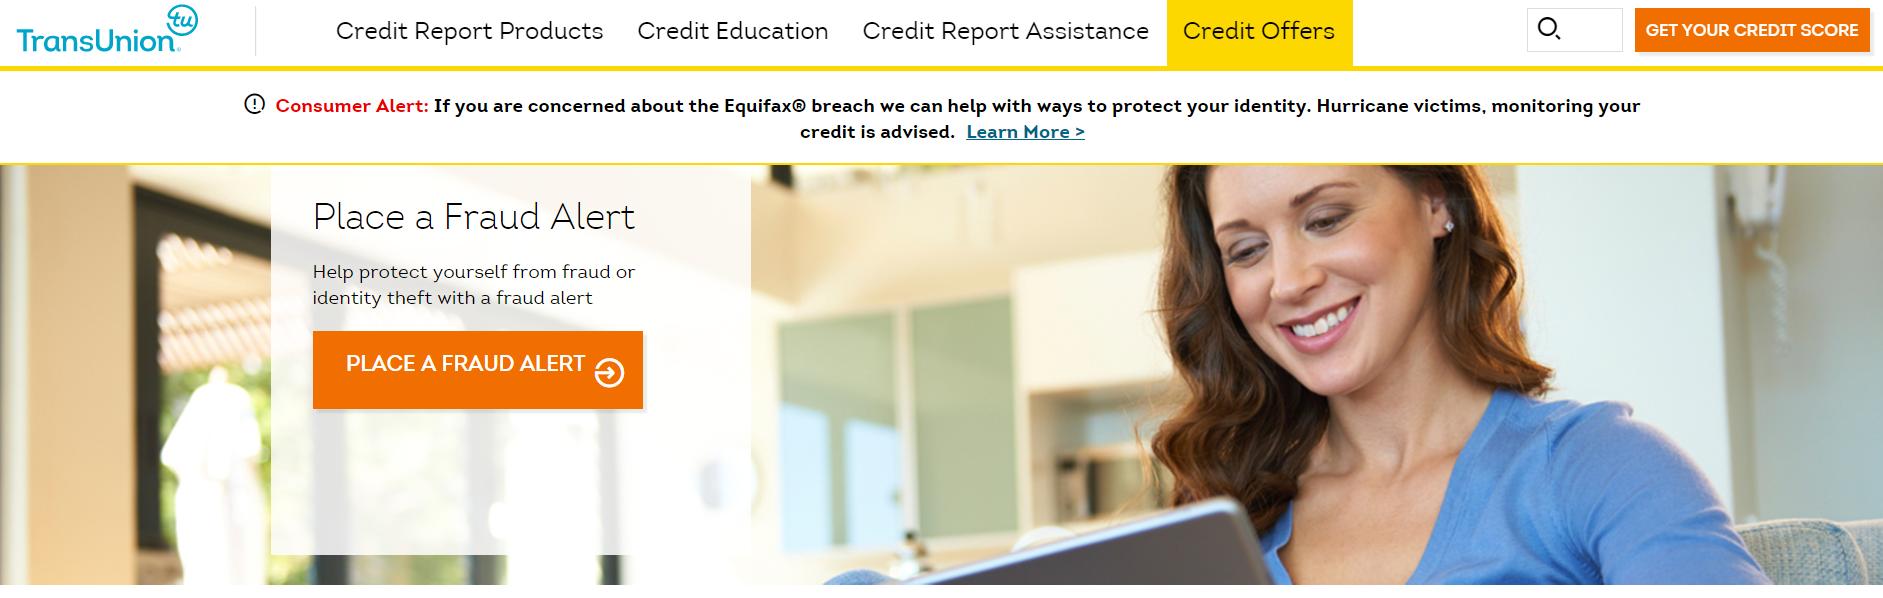 TransUnion網站首頁已列出Equifax受駭者如何登記「欺詐警戒」。(網站)